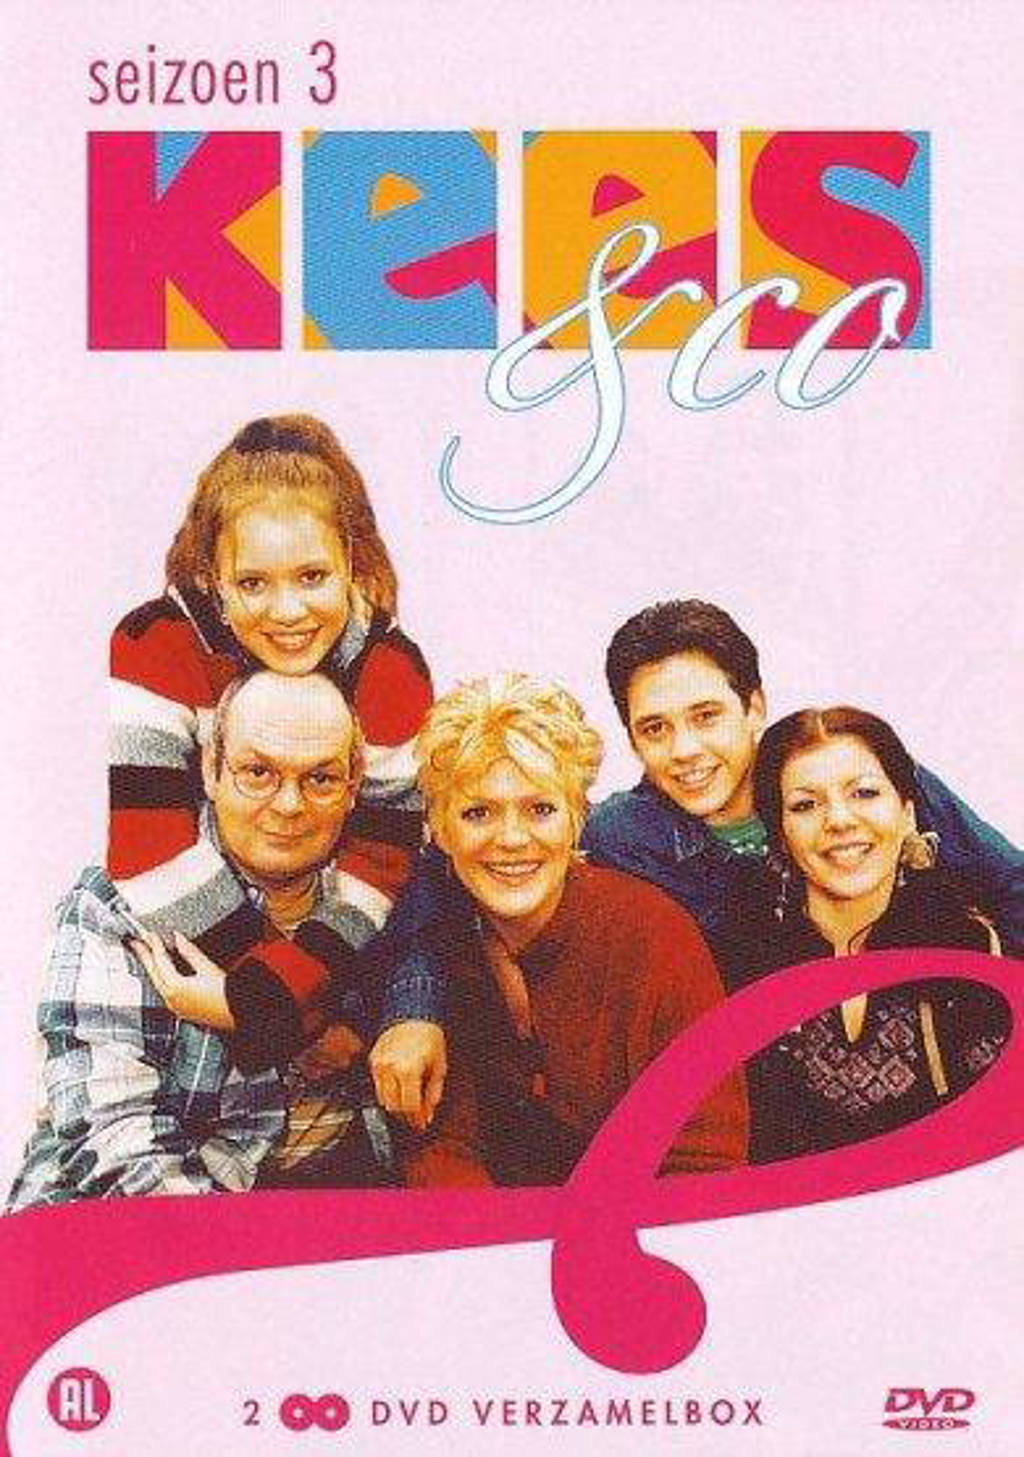 Kees & Co - Seizoen 3 (DVD)